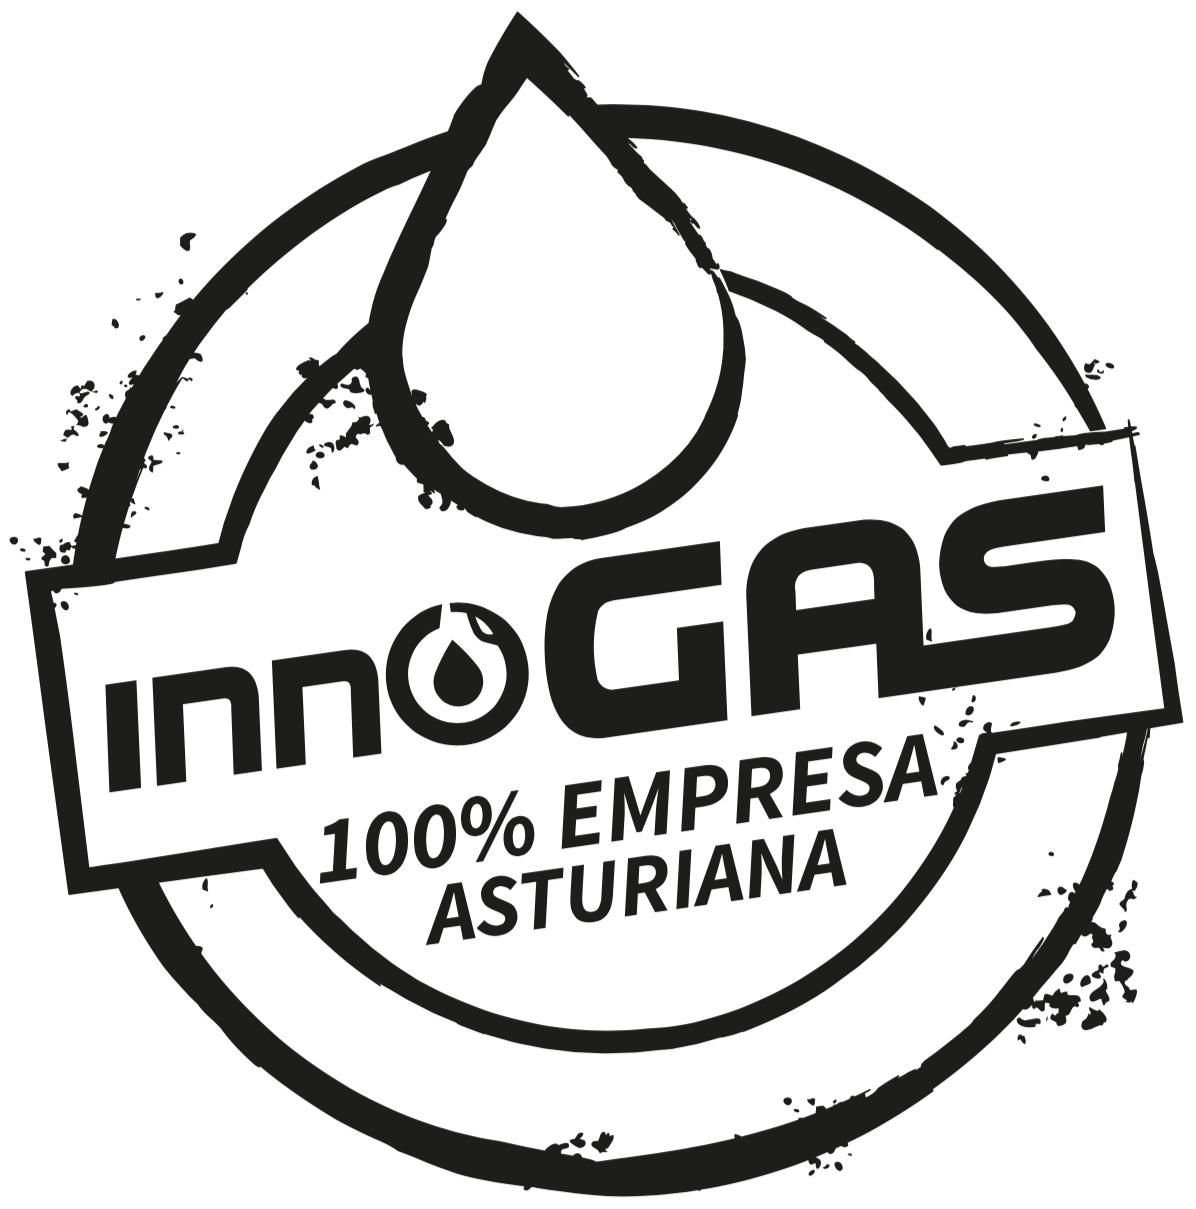 innogas empresa asturiana